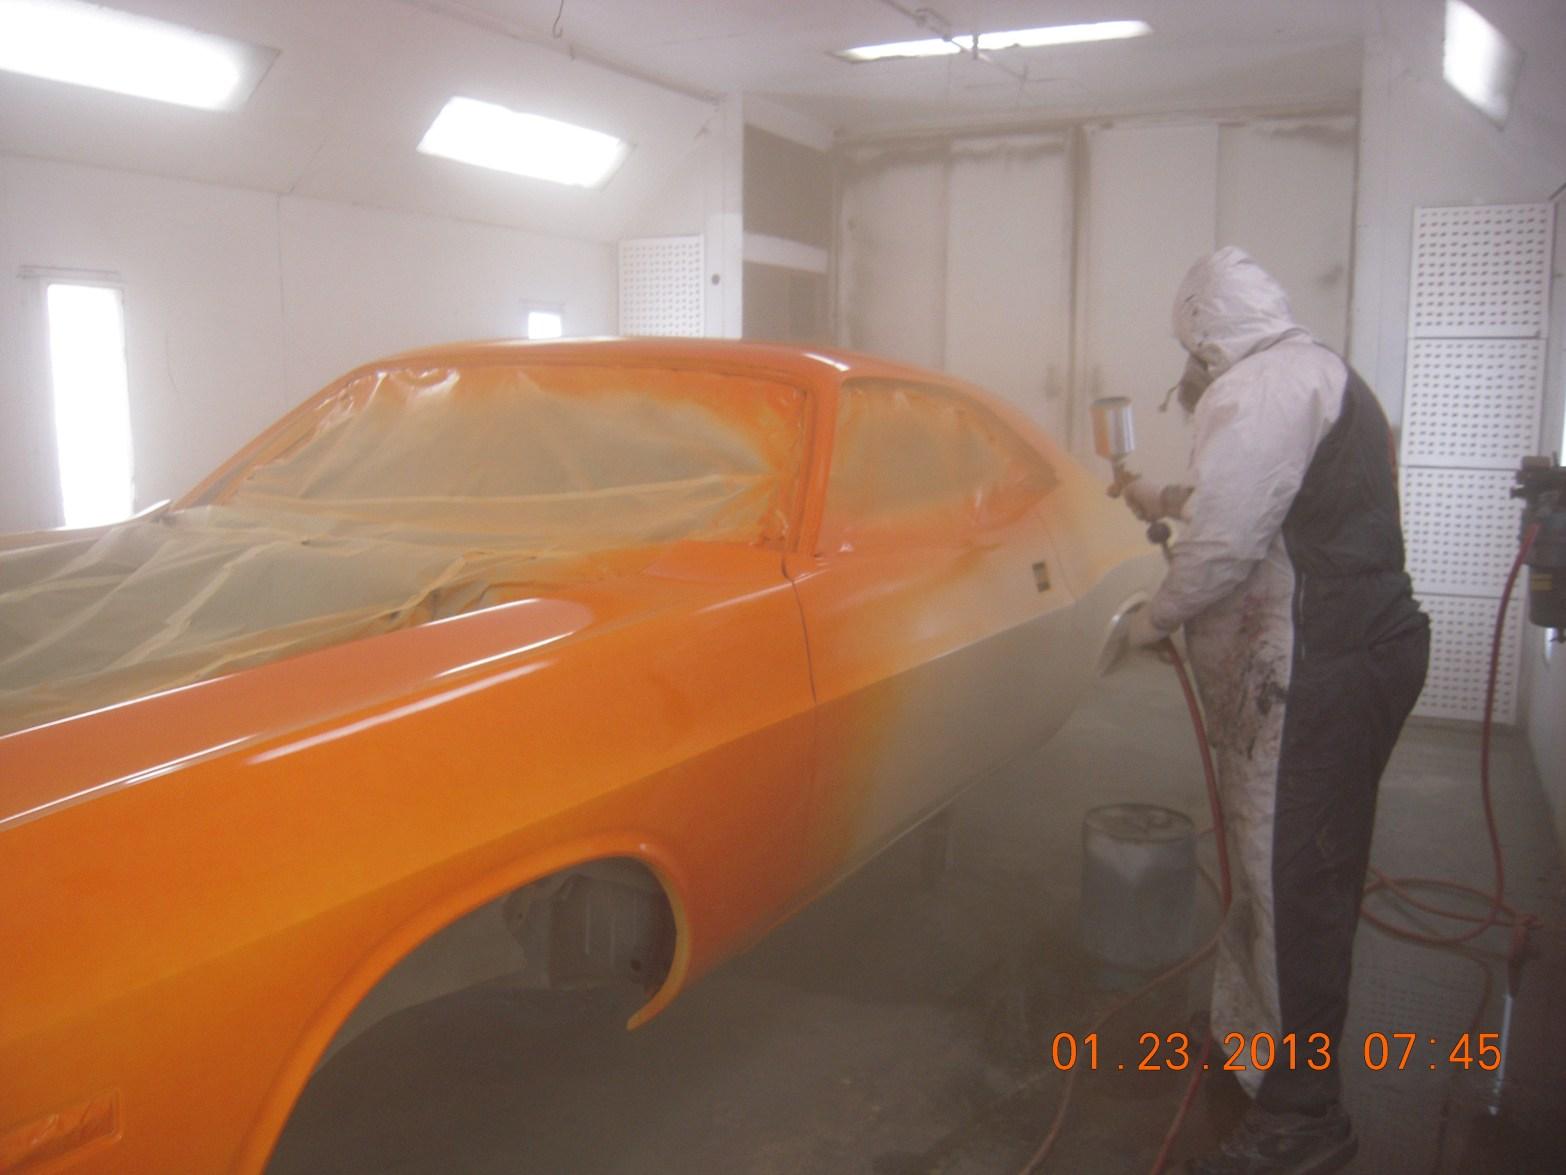 west-coast-body-and-paint-orange-1970-challenger-100